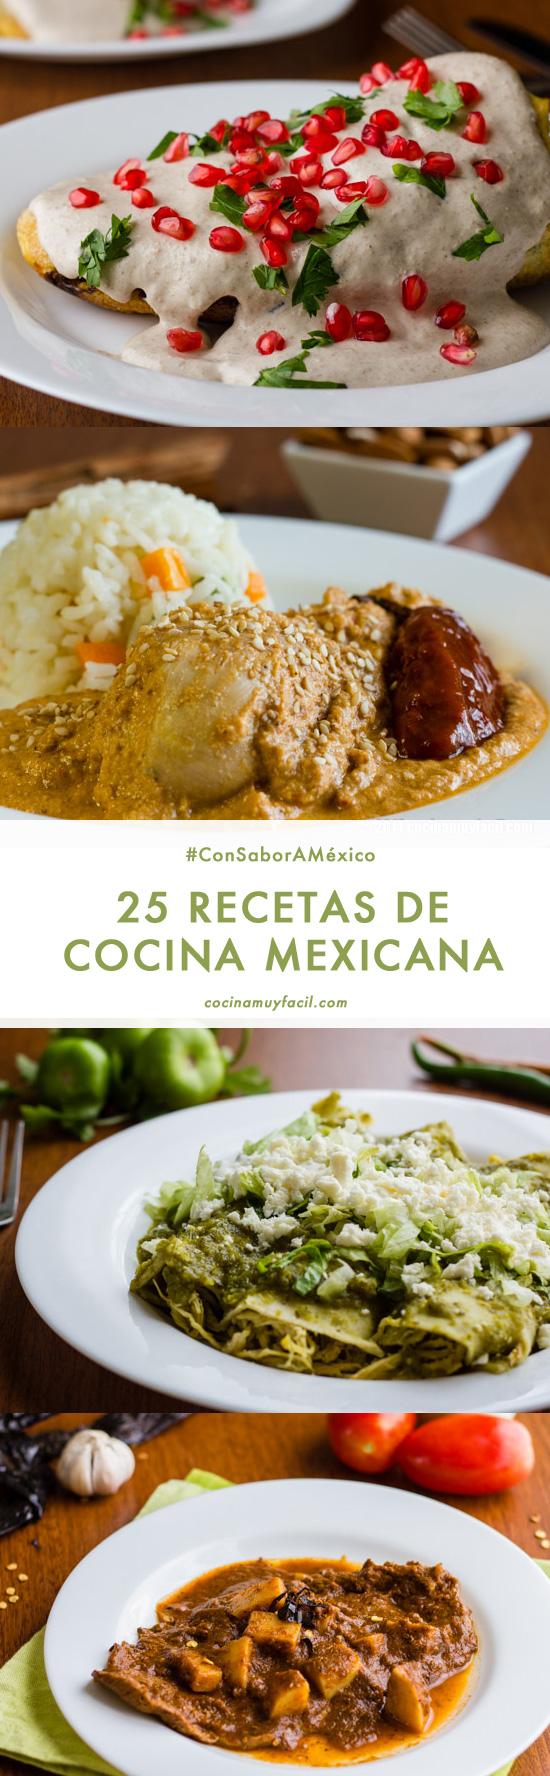 12 Recetas de Cocina Mexicana para Celebrar  Cocina Muy Facil